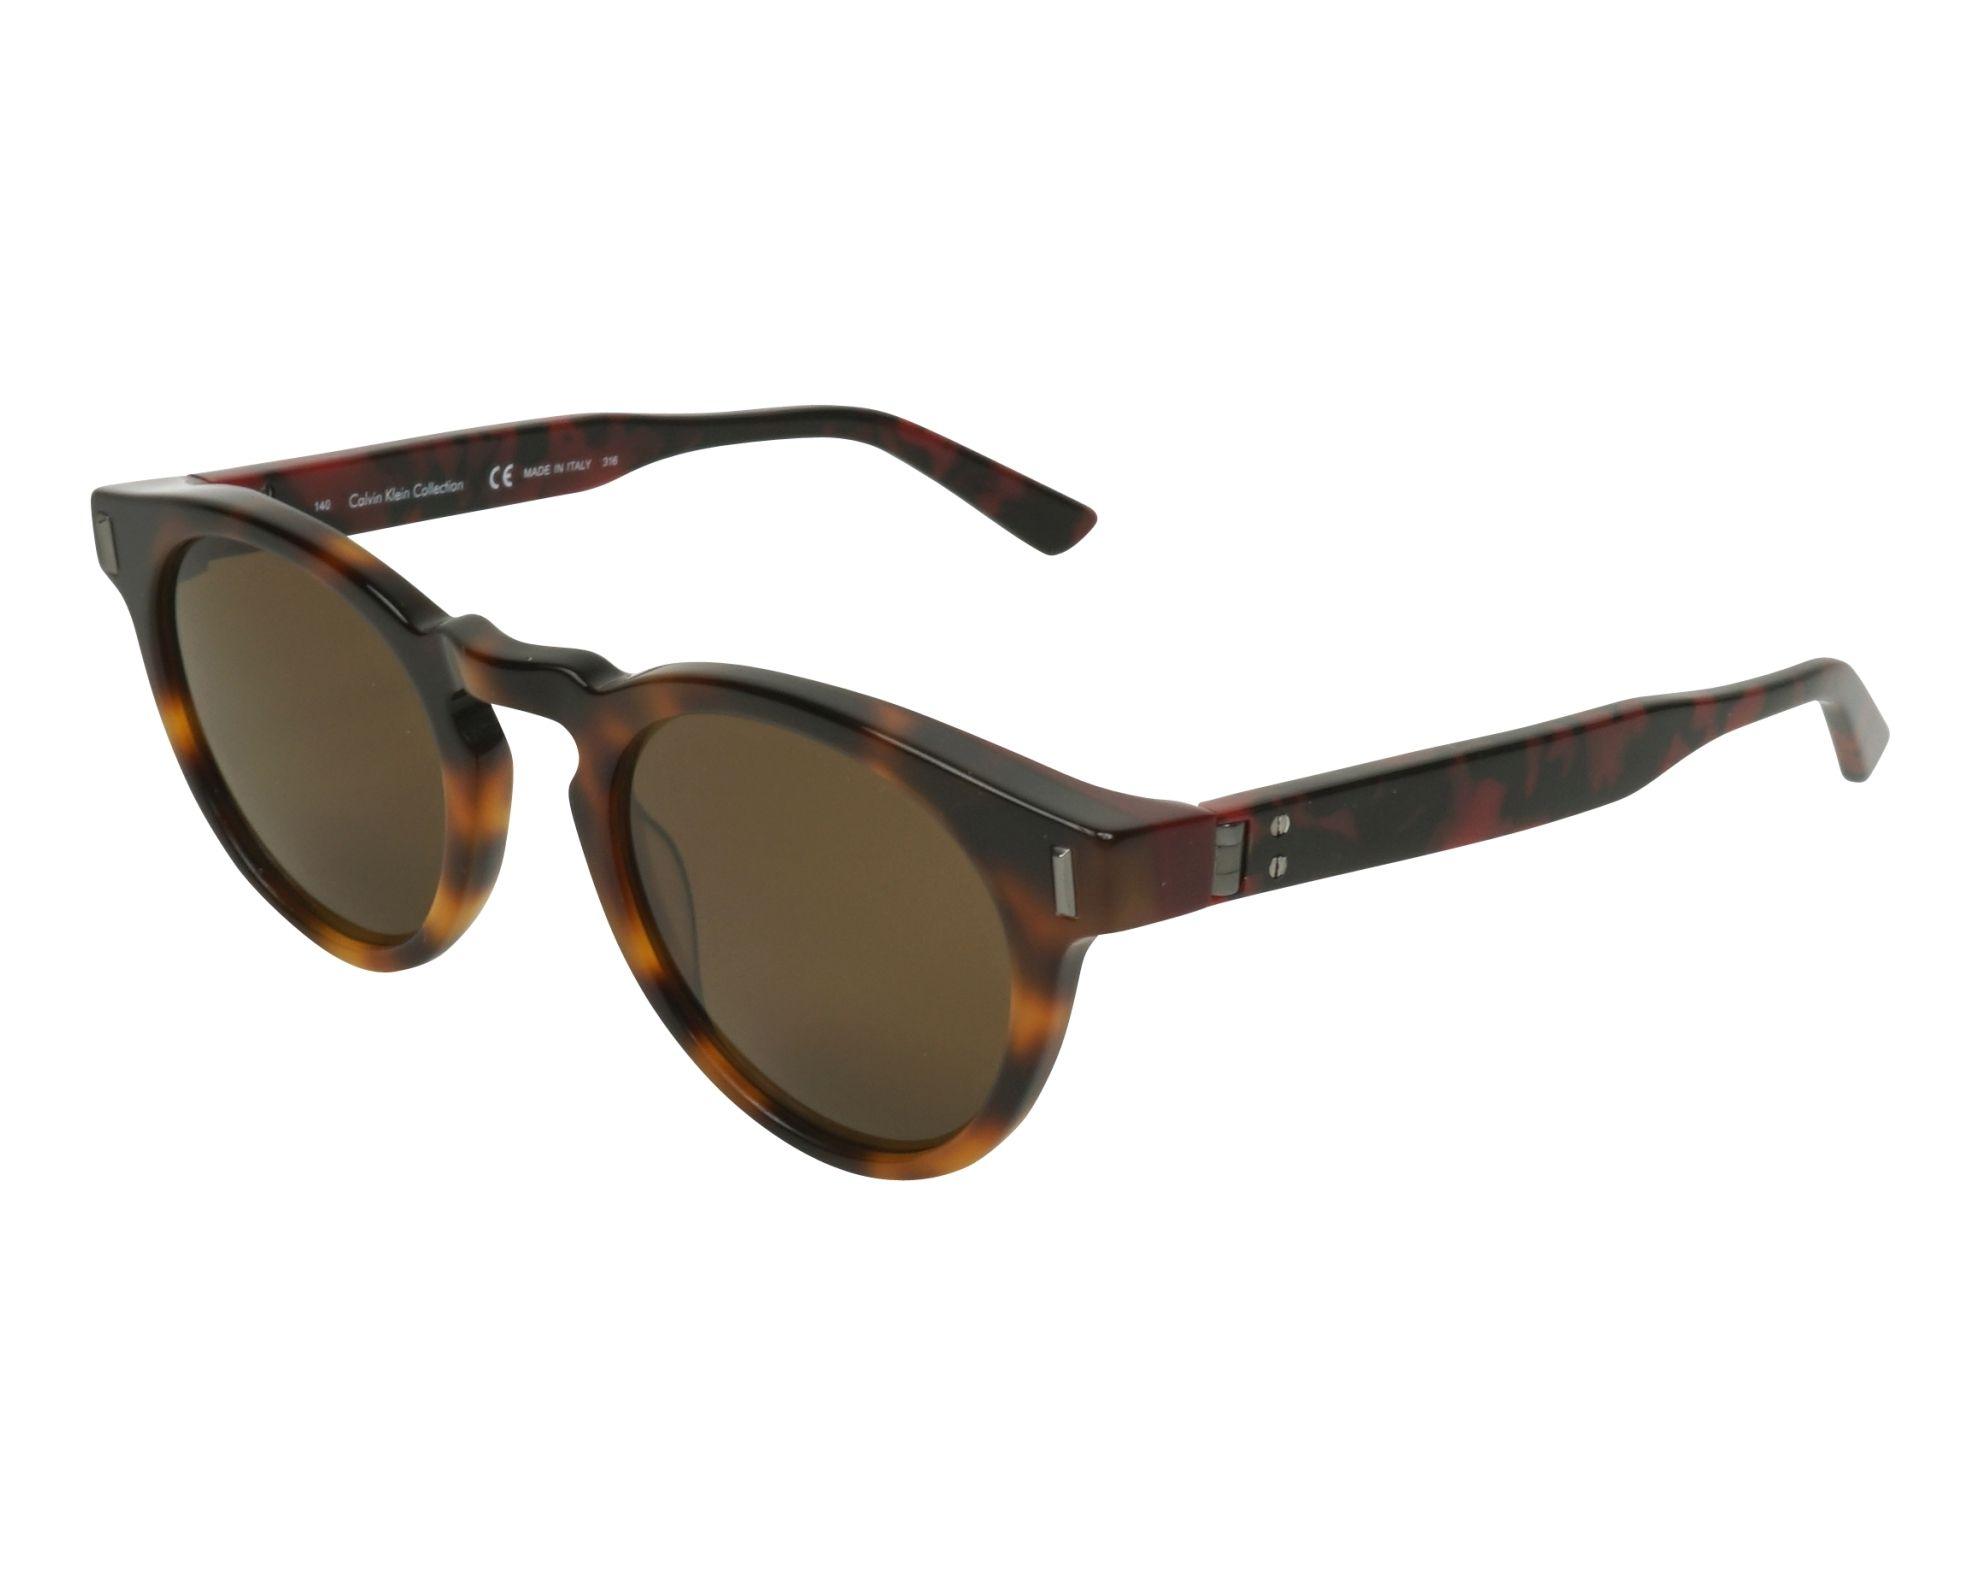 90f49961aa84 Sunglasses Calvin Klein CK-8547-S 218 49-22 Havana Red profile view